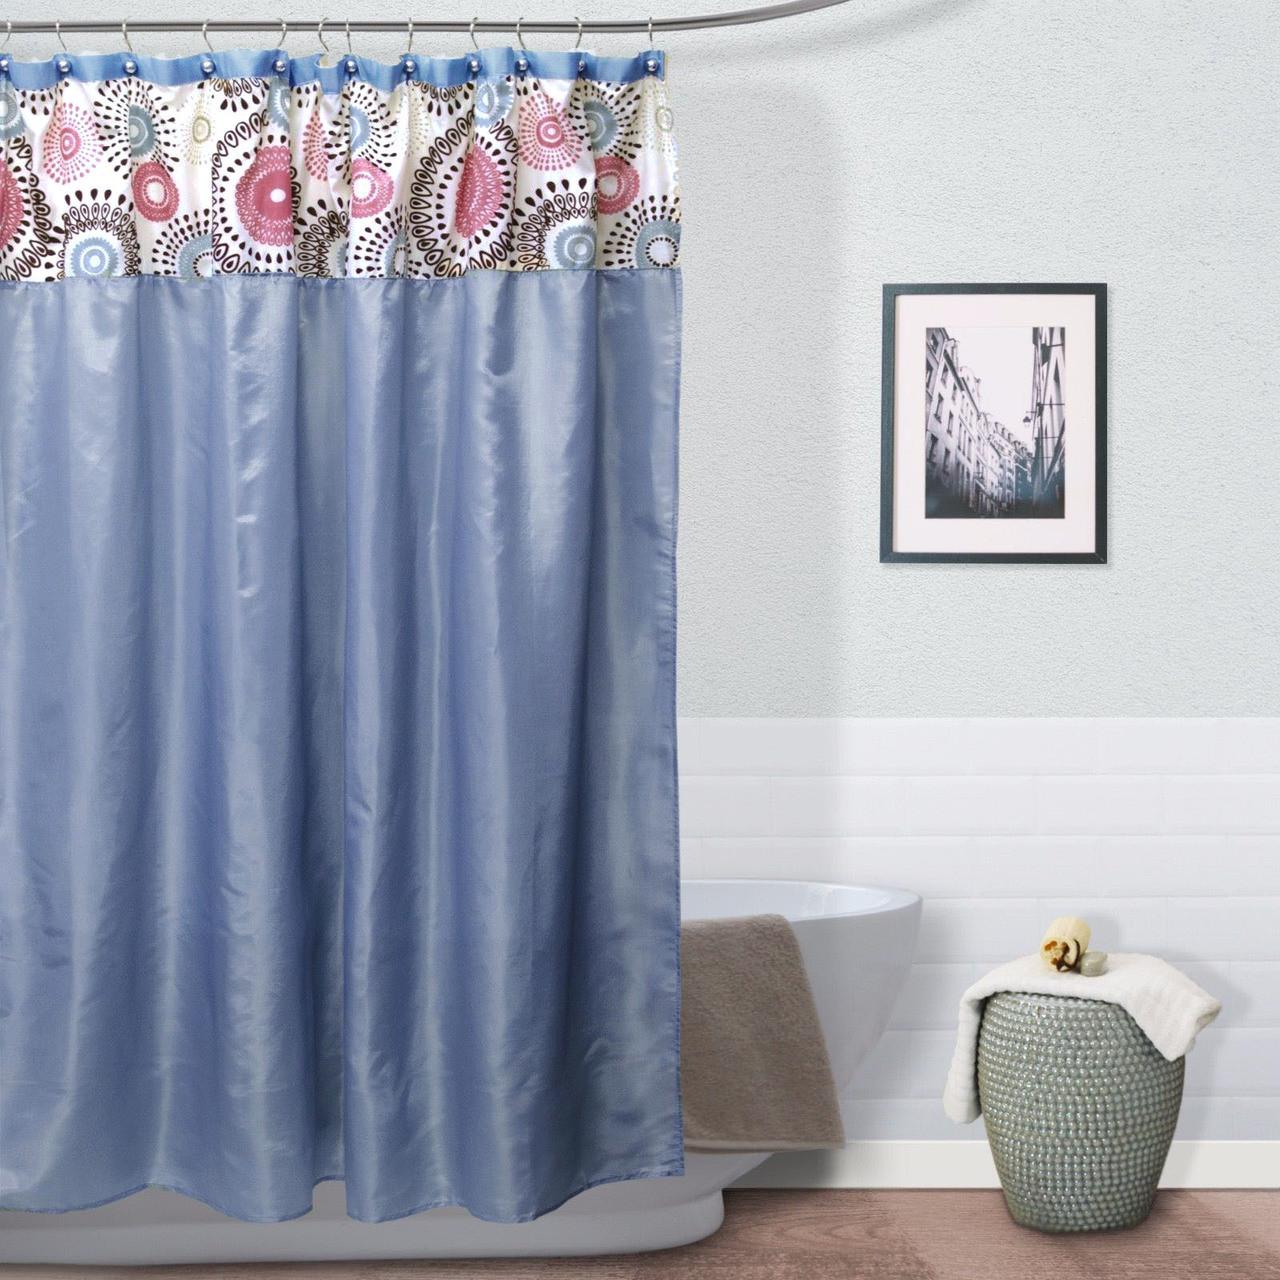 Bon Meghan Fabric Shower Curtain, Jointed Teardrops Flocking Top   Blue,  Chocolate Or Burgundy